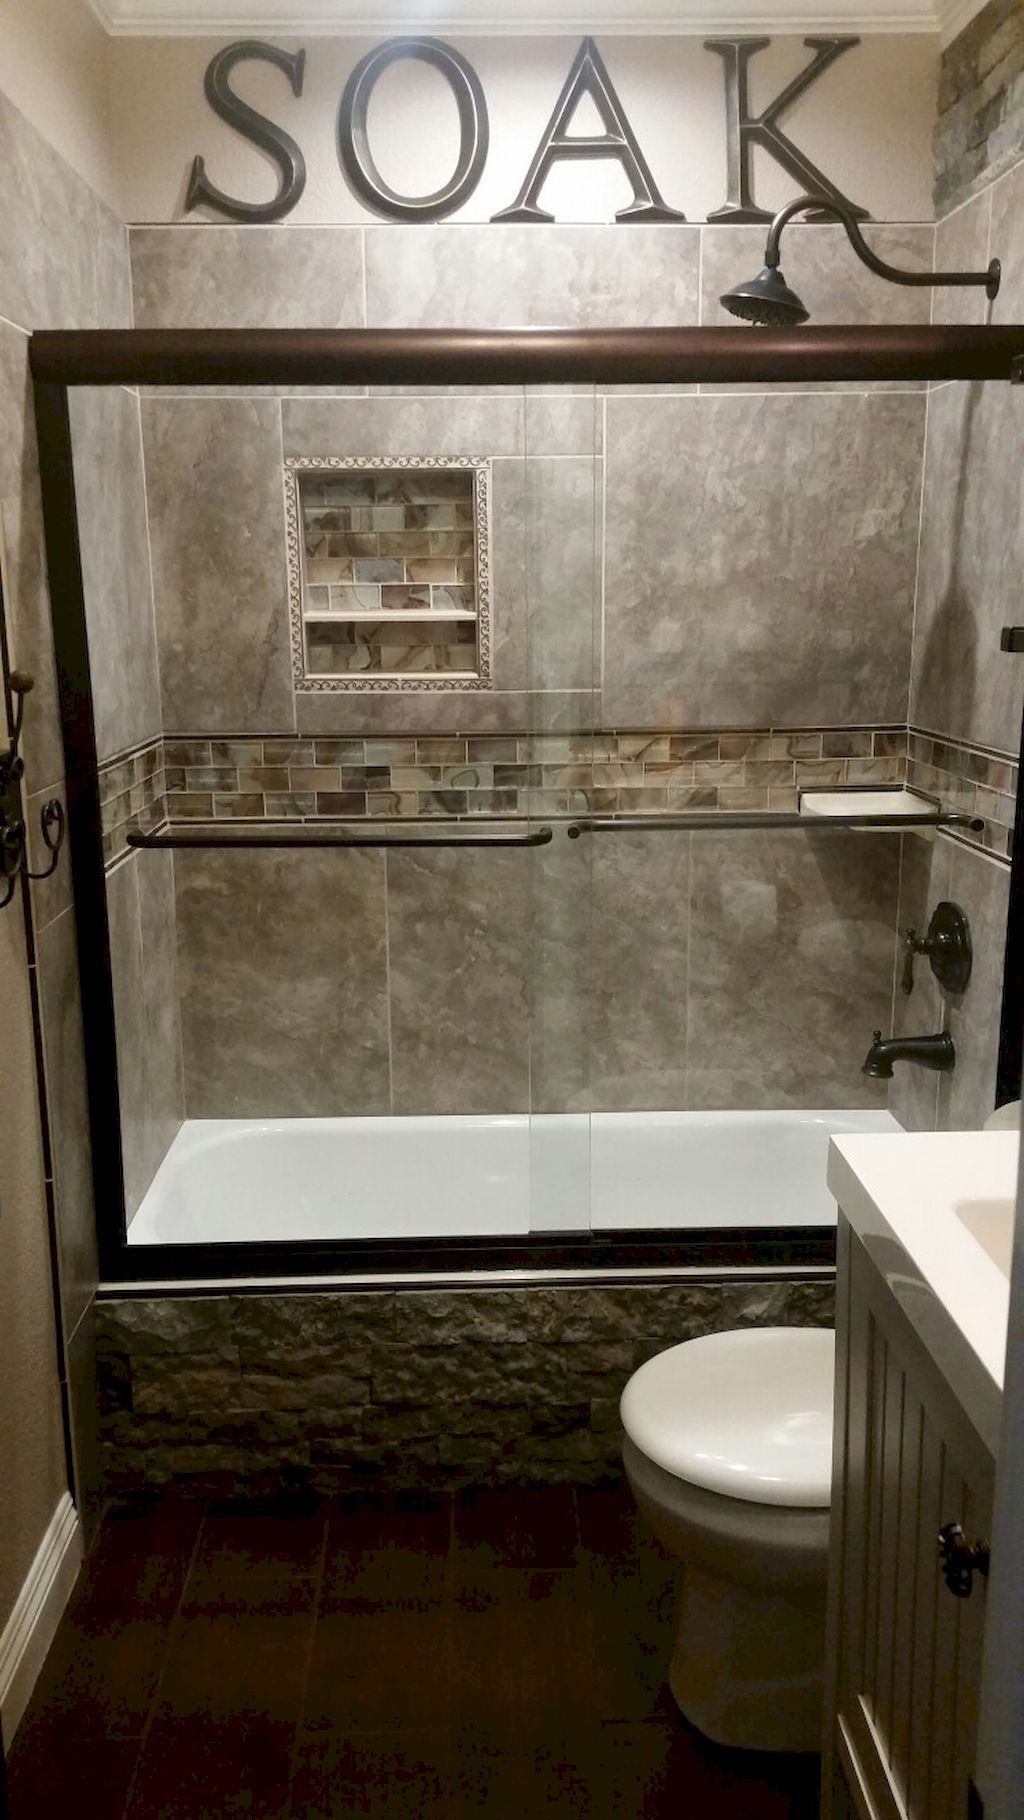 small bathroom remodel bathroom renovation ideas guest on bathroom renovation ideas for small bathrooms id=70447